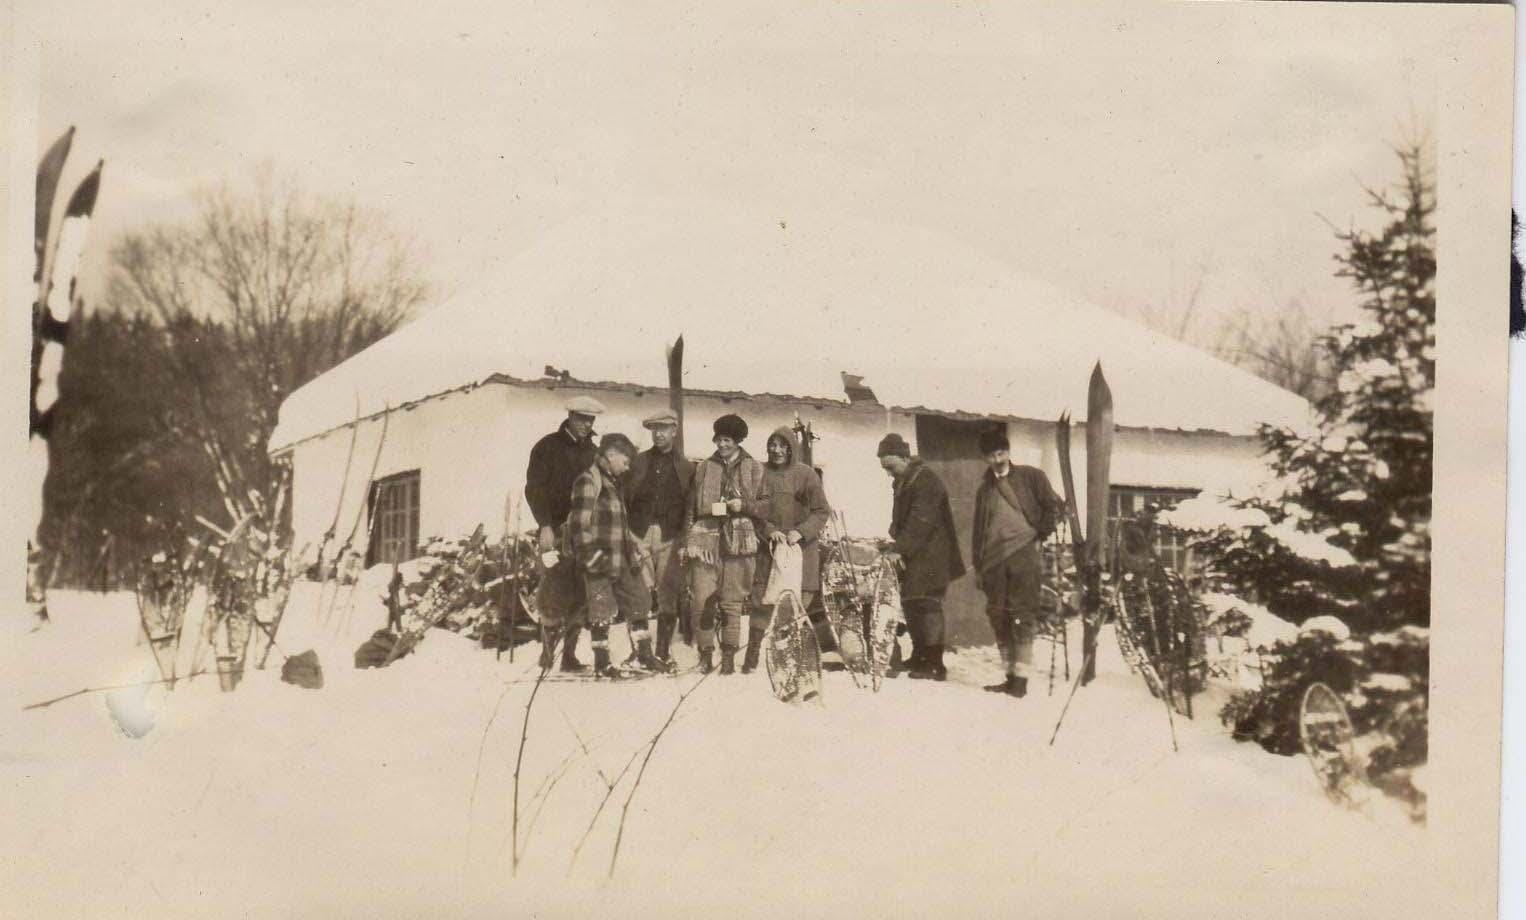 1929, Zoe Bodman and group